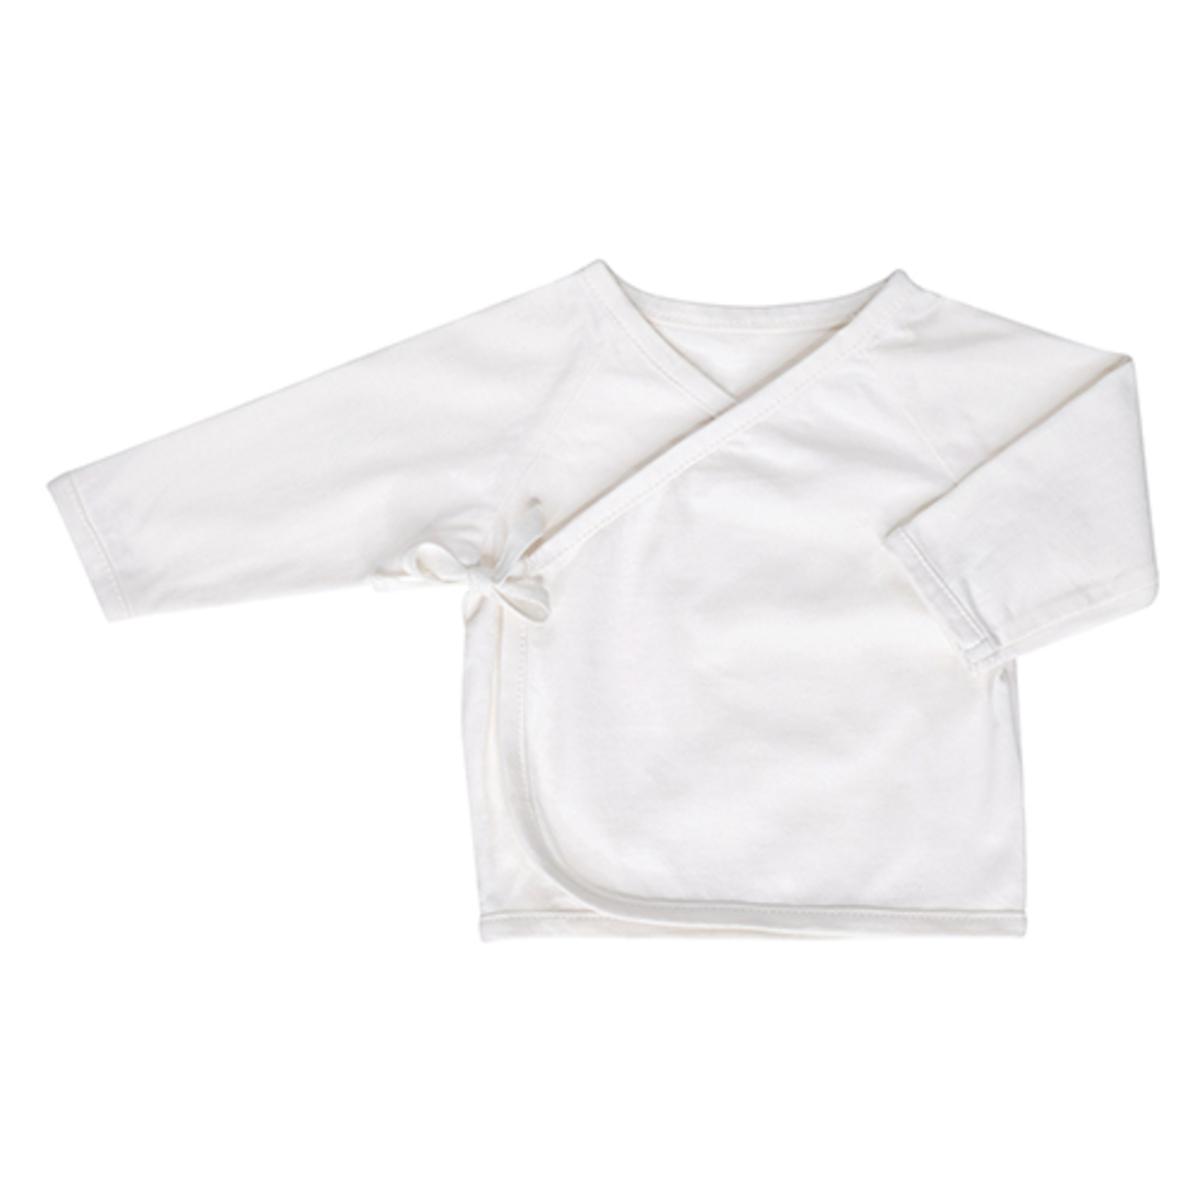 Haut bébé Cardigan Kimono Cream - 3 Mois Cardigan Kimono Cream - 3 Mois